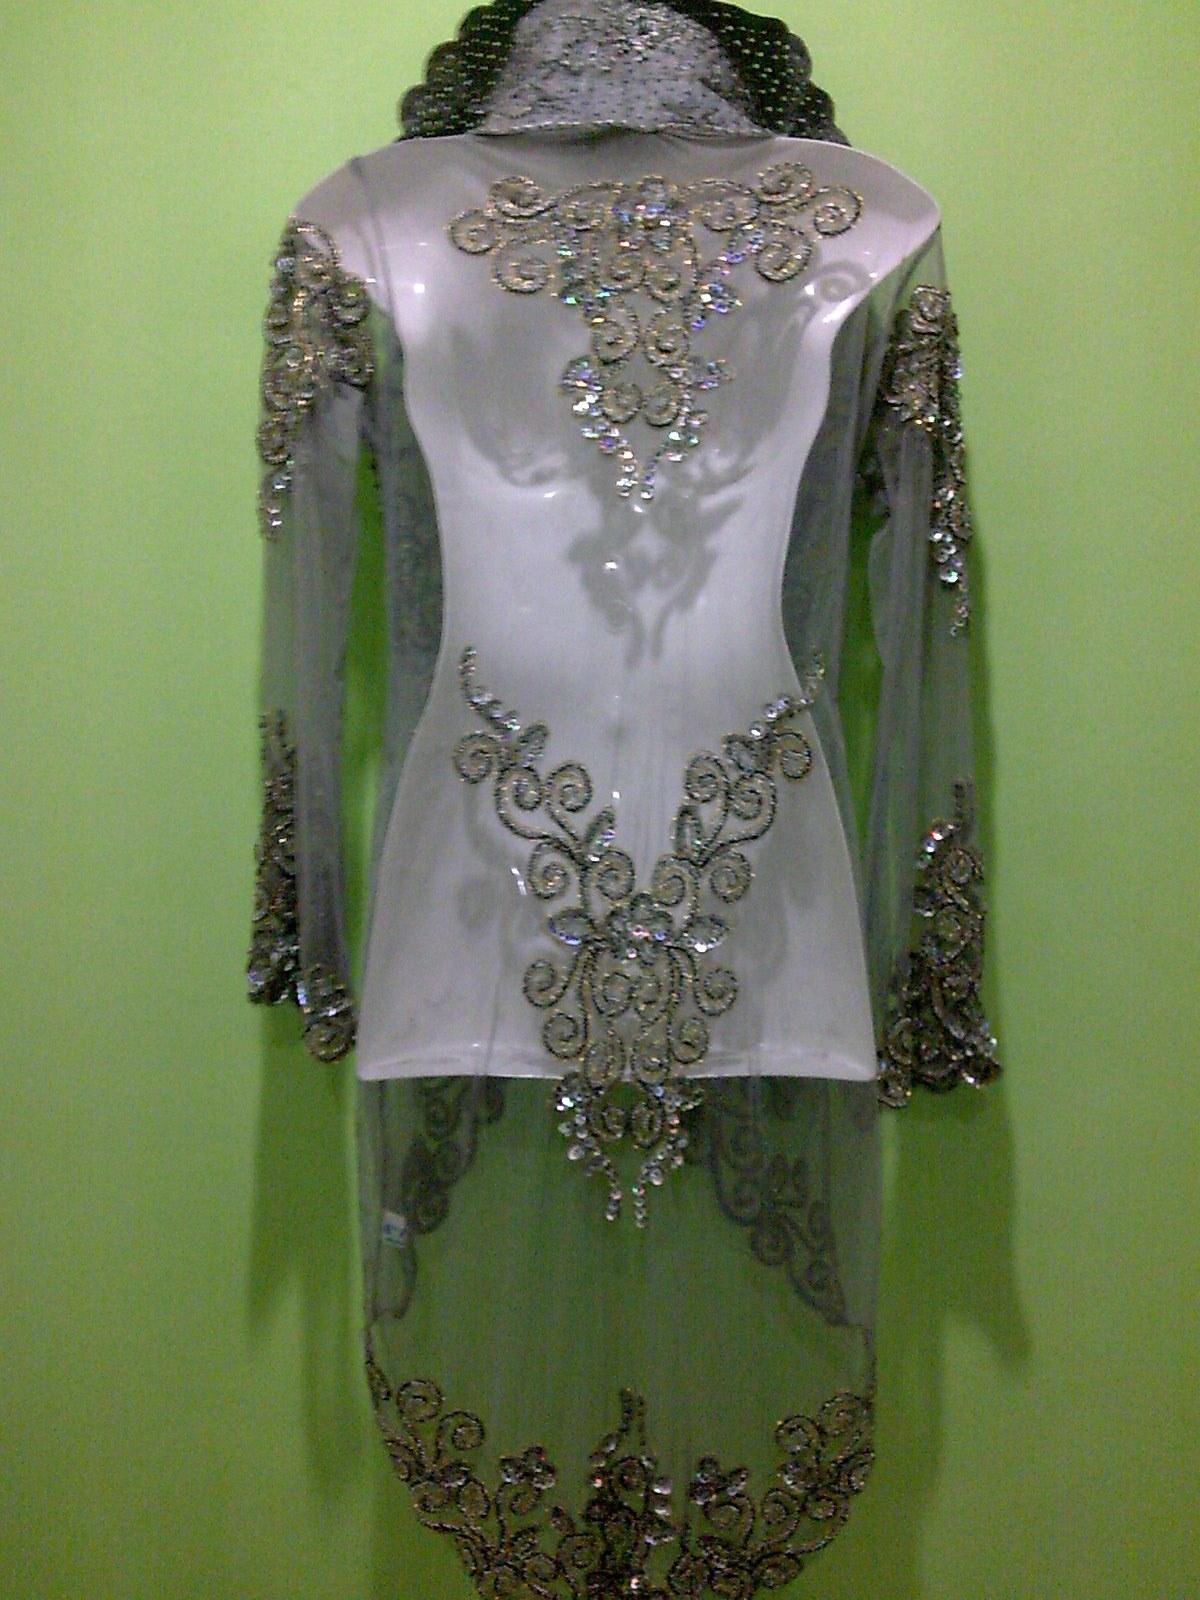 Ide Baju Pengantin Muslimah Jawa Syar'i 8ydm Baju Pengantin Muslimah